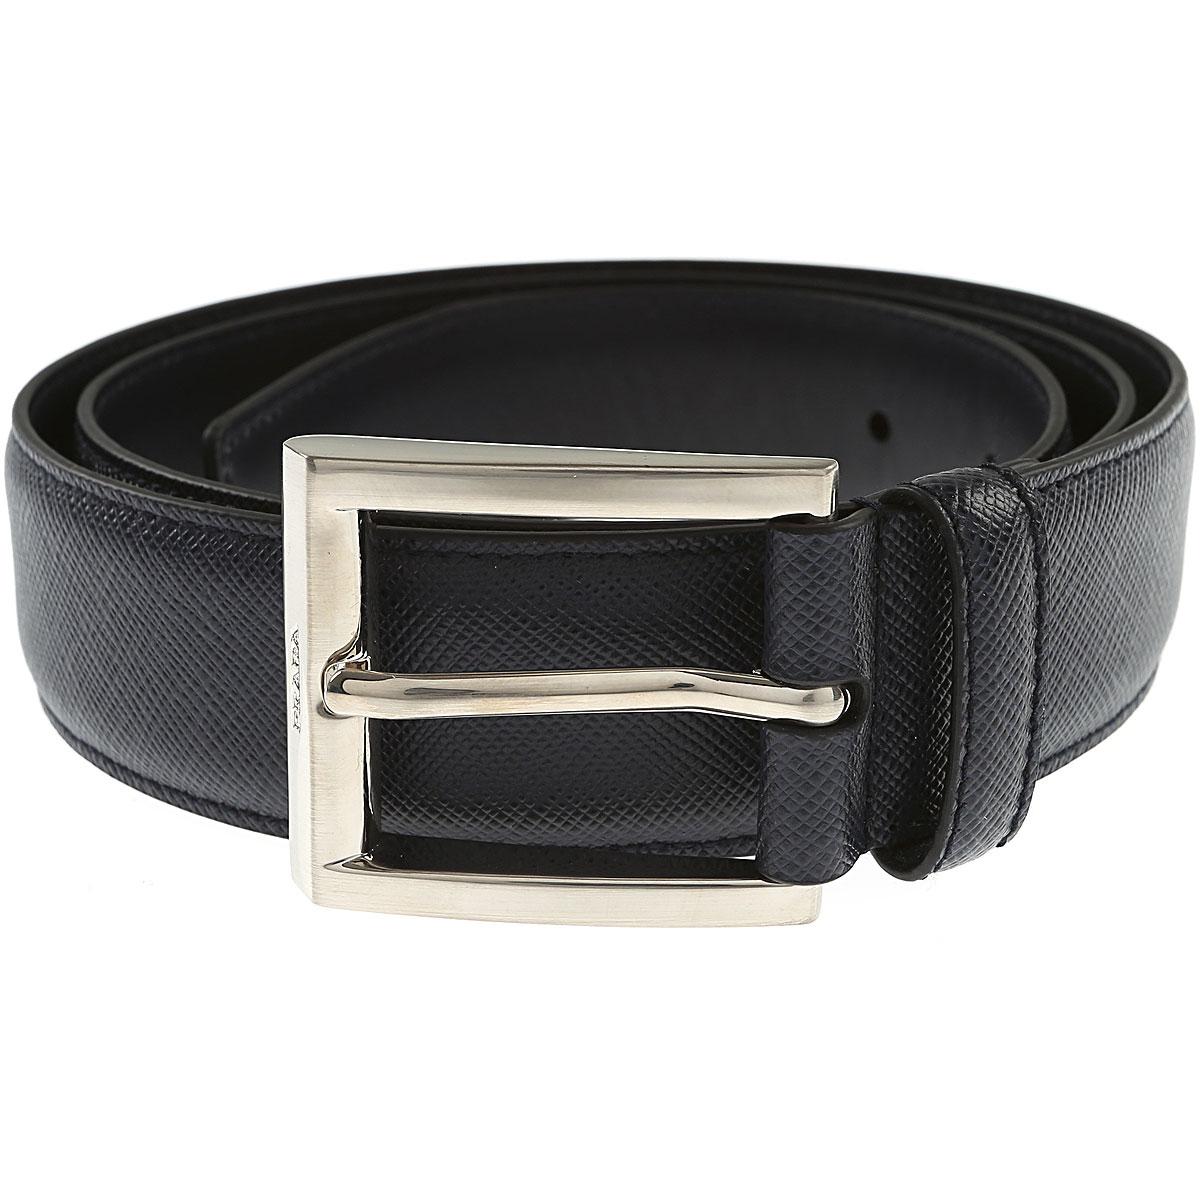 Prada Belts On Sale, Blue Ink, Saffiano, 2019, 36 38 40